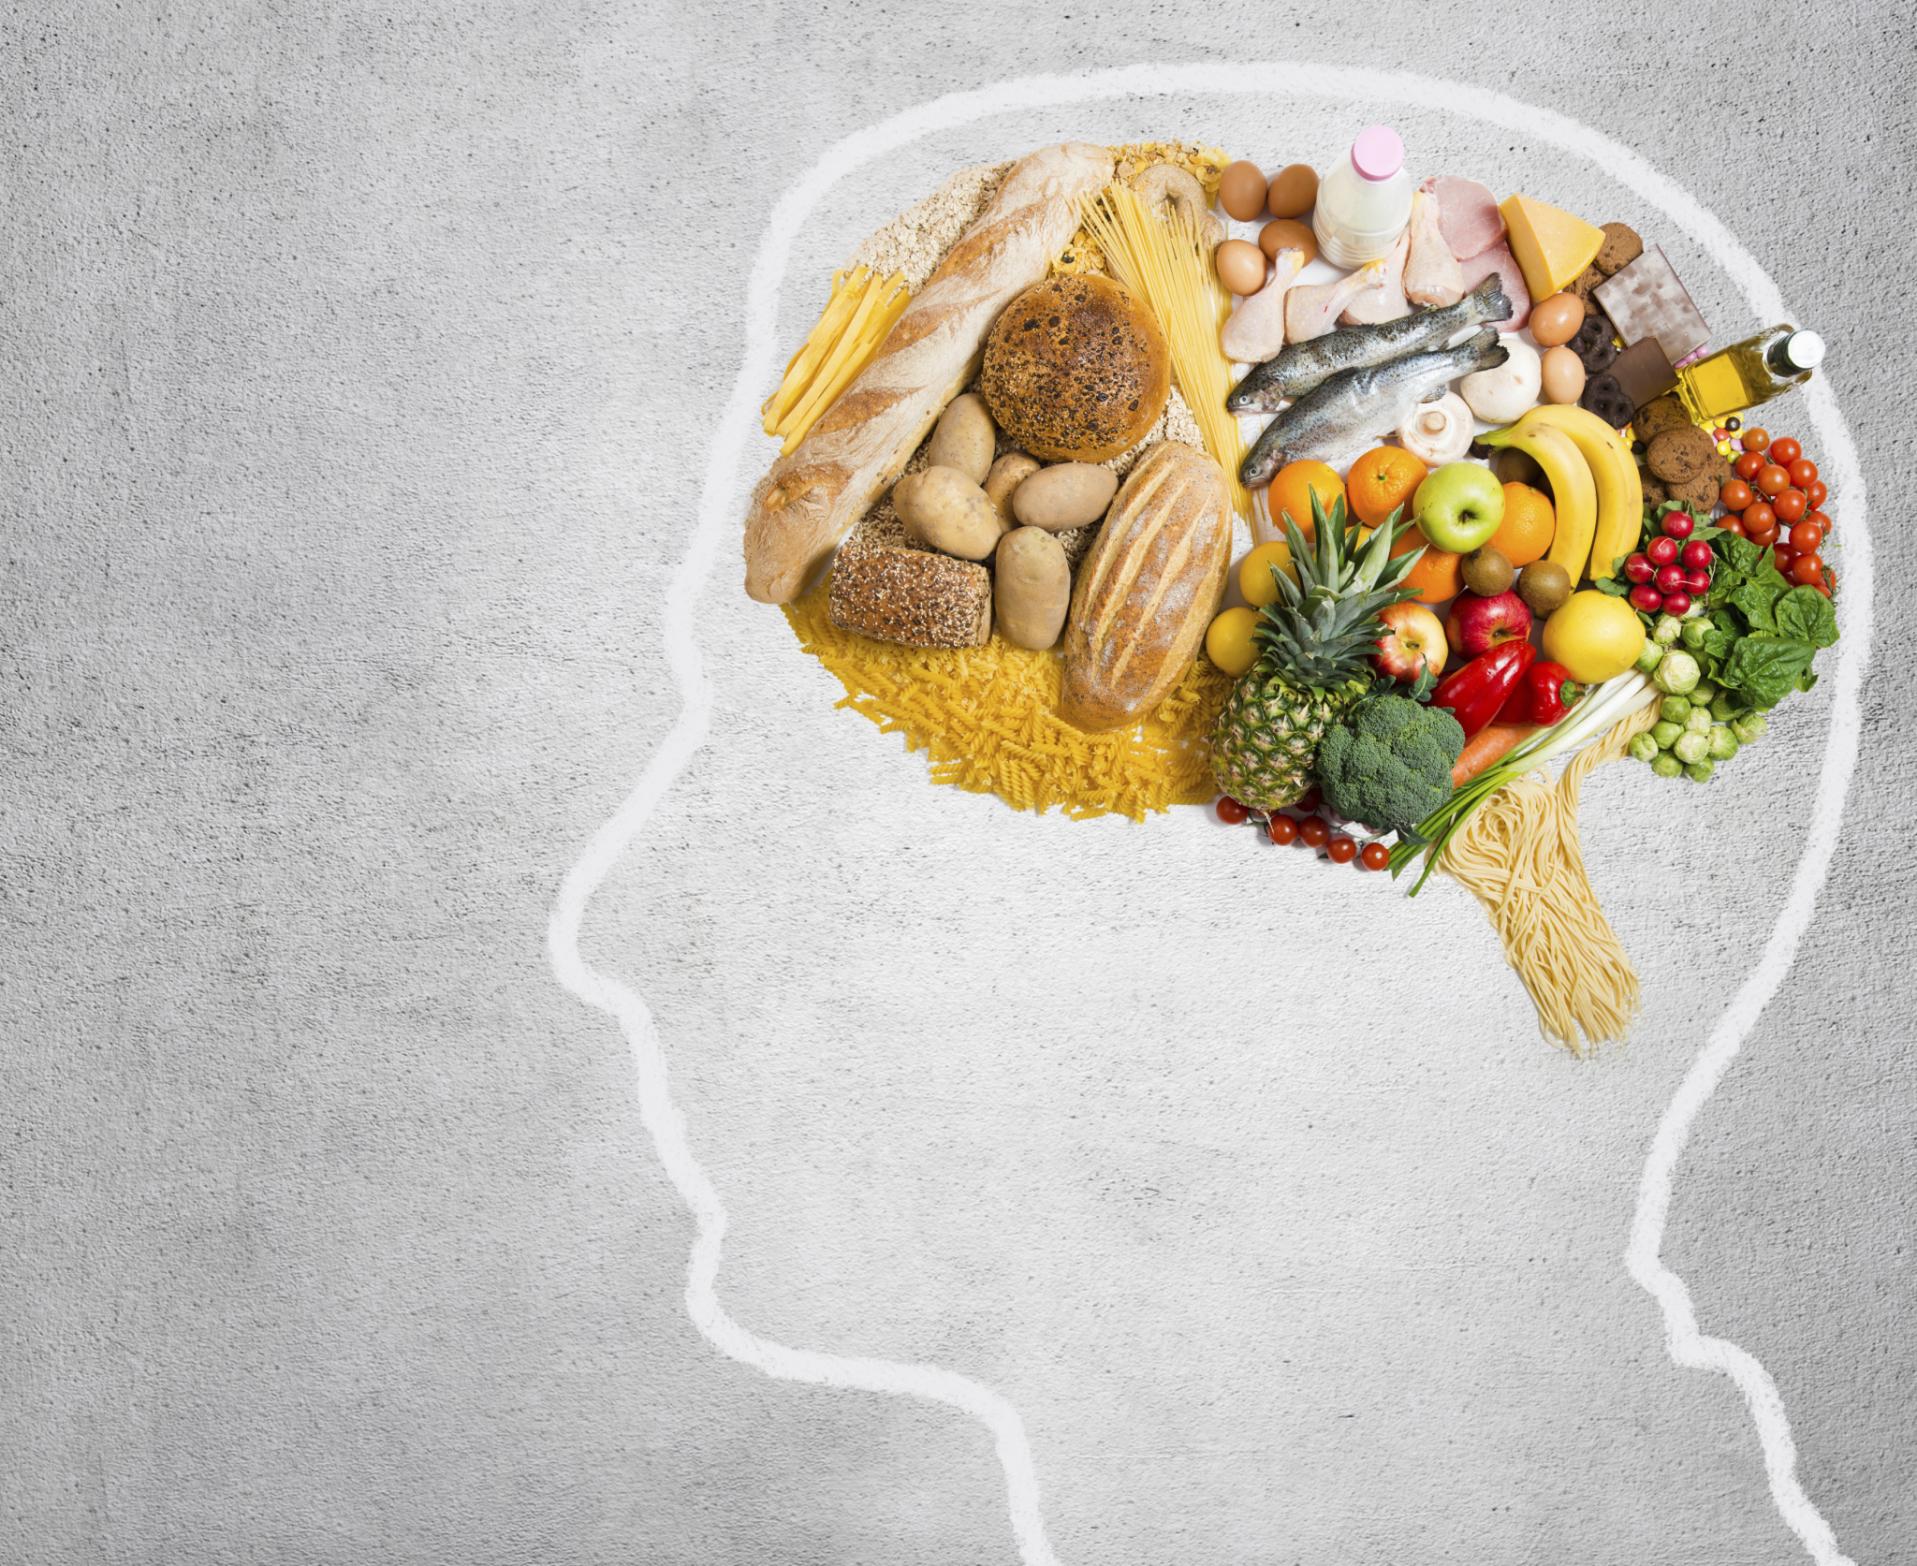 The brain-saving diet